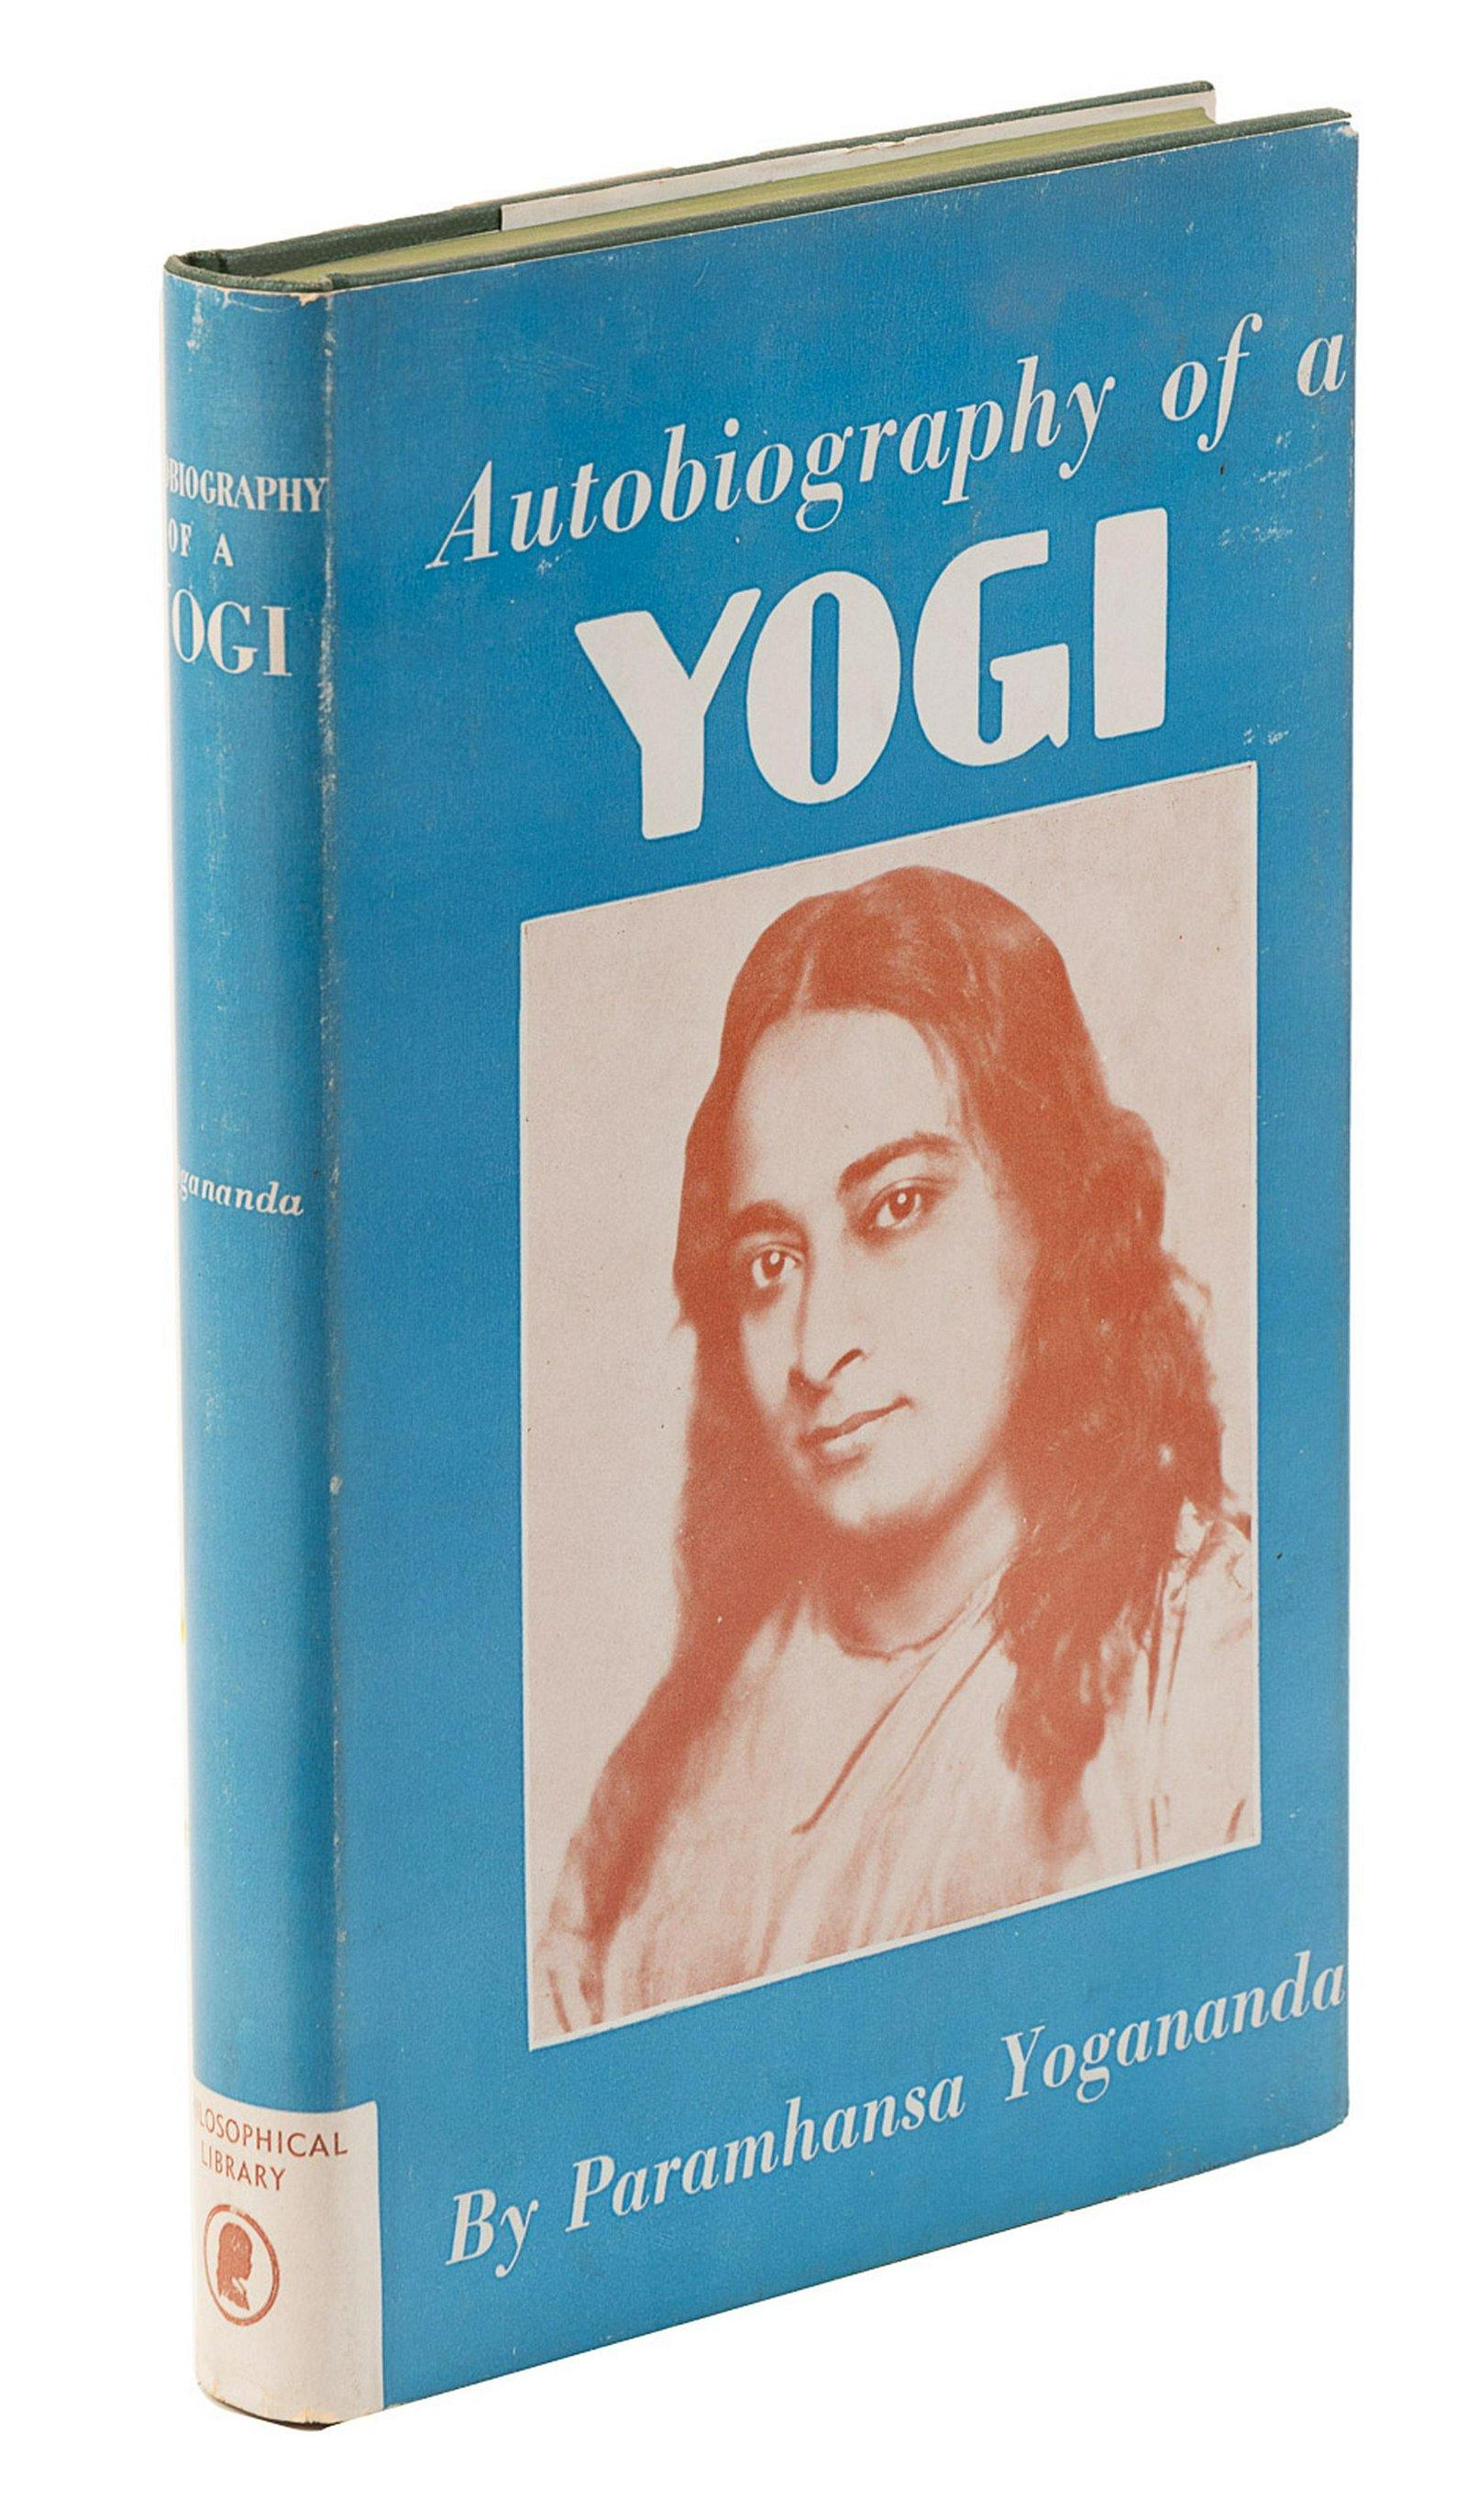 Autobiography of a Yogi 1st ed w/jacket